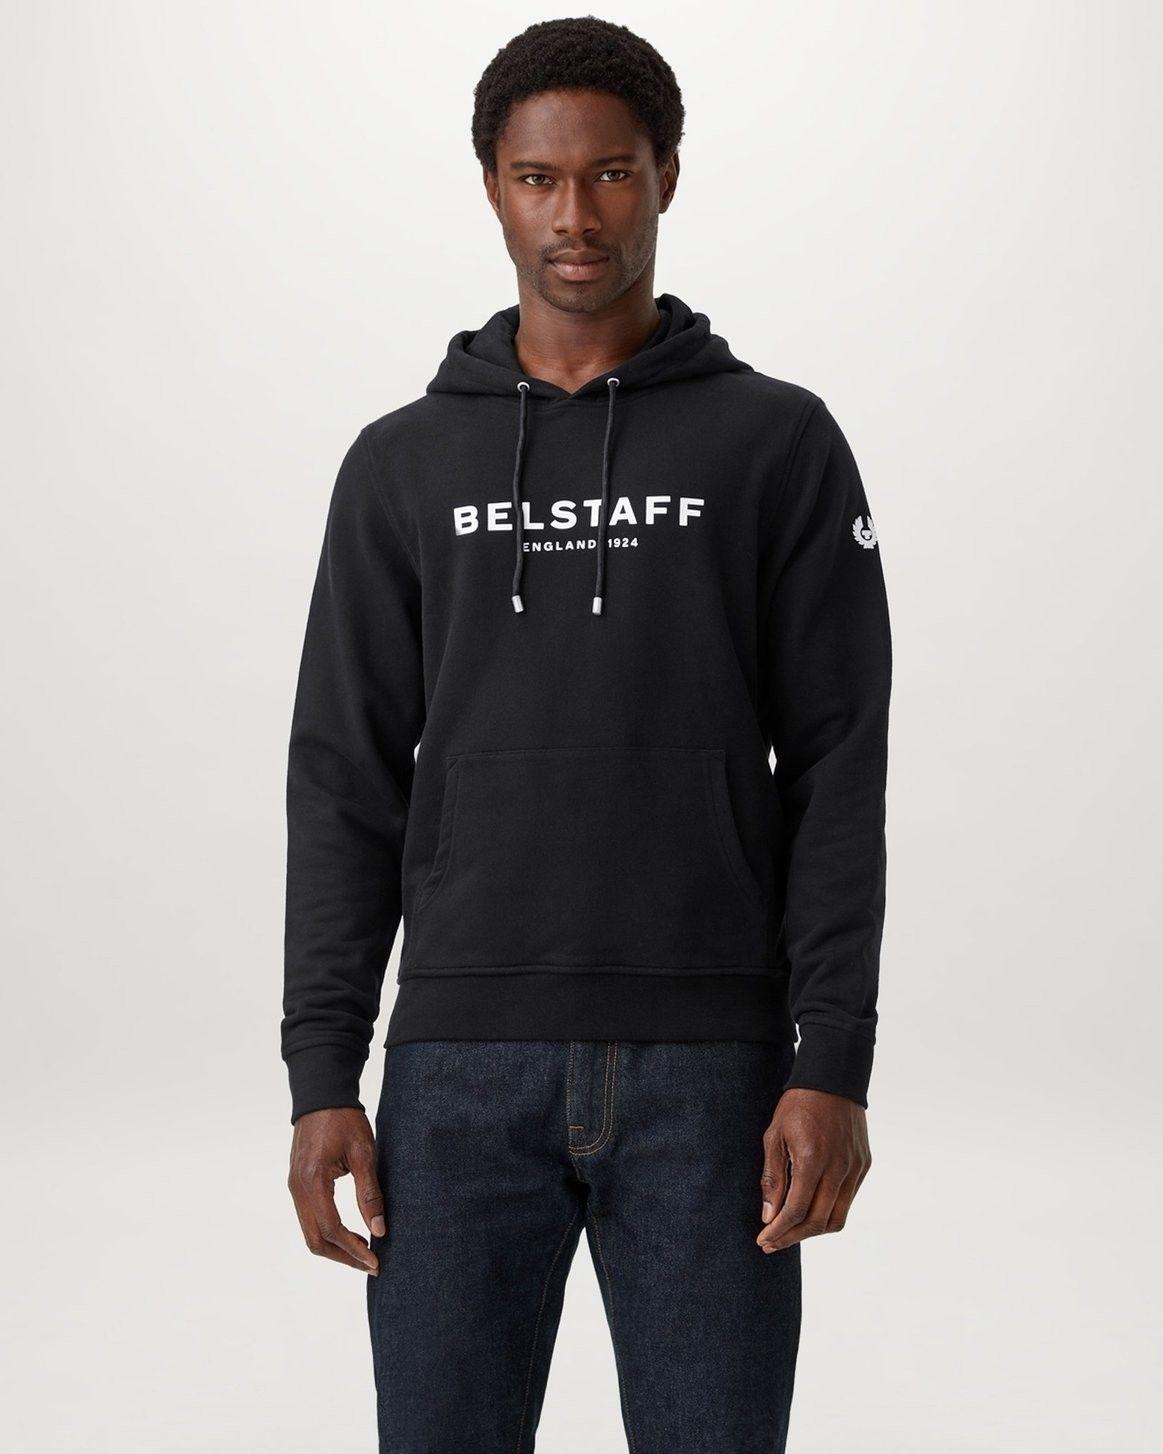 BELSTAFF - Herren Pullover - 1924 Sweater - Black/White